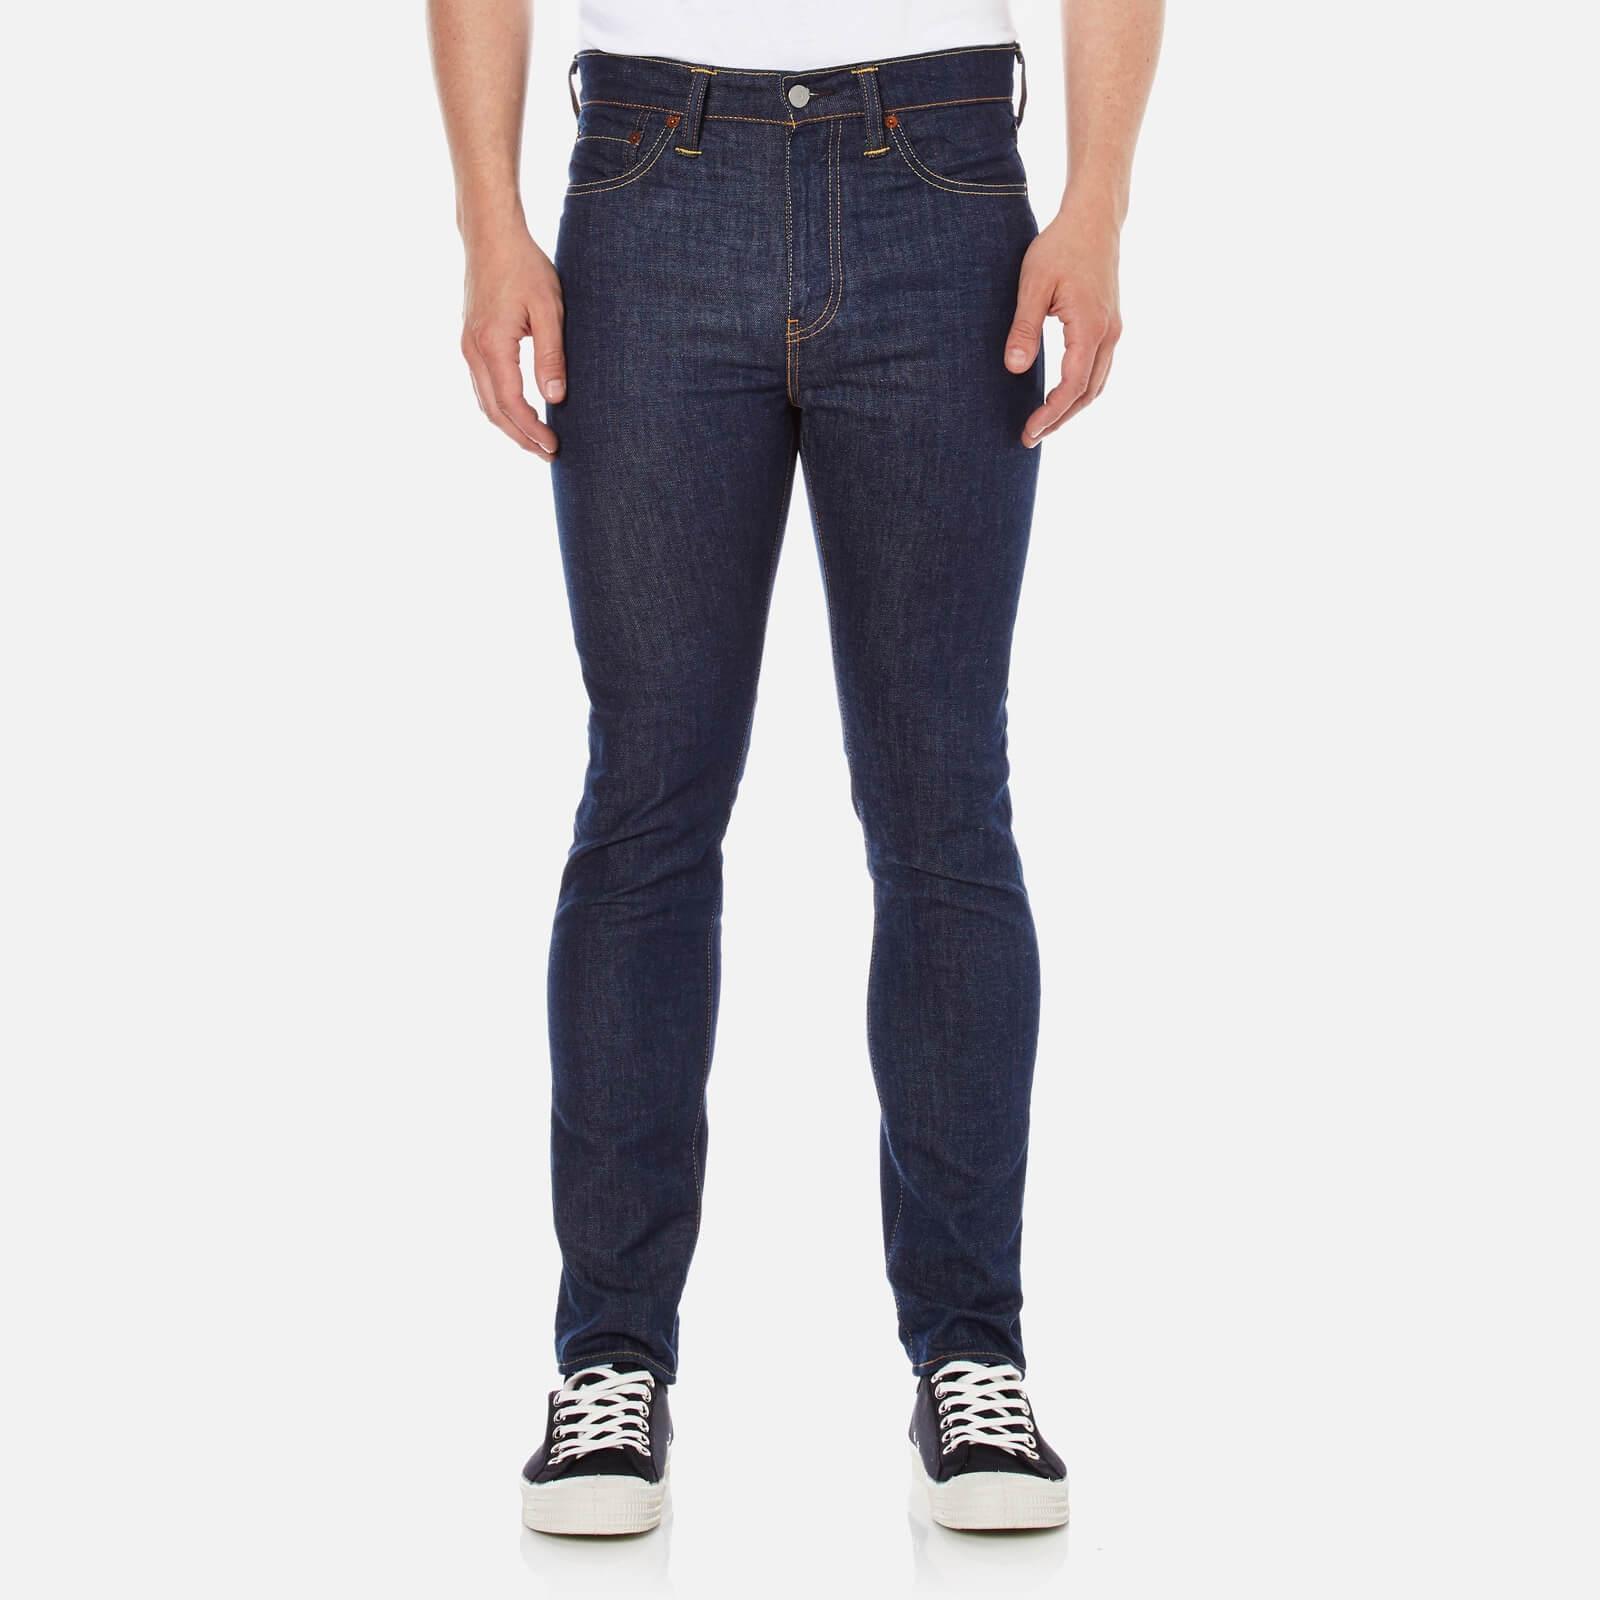 Levi's Men's 510 Skinny Fit Jeans Broken Raw